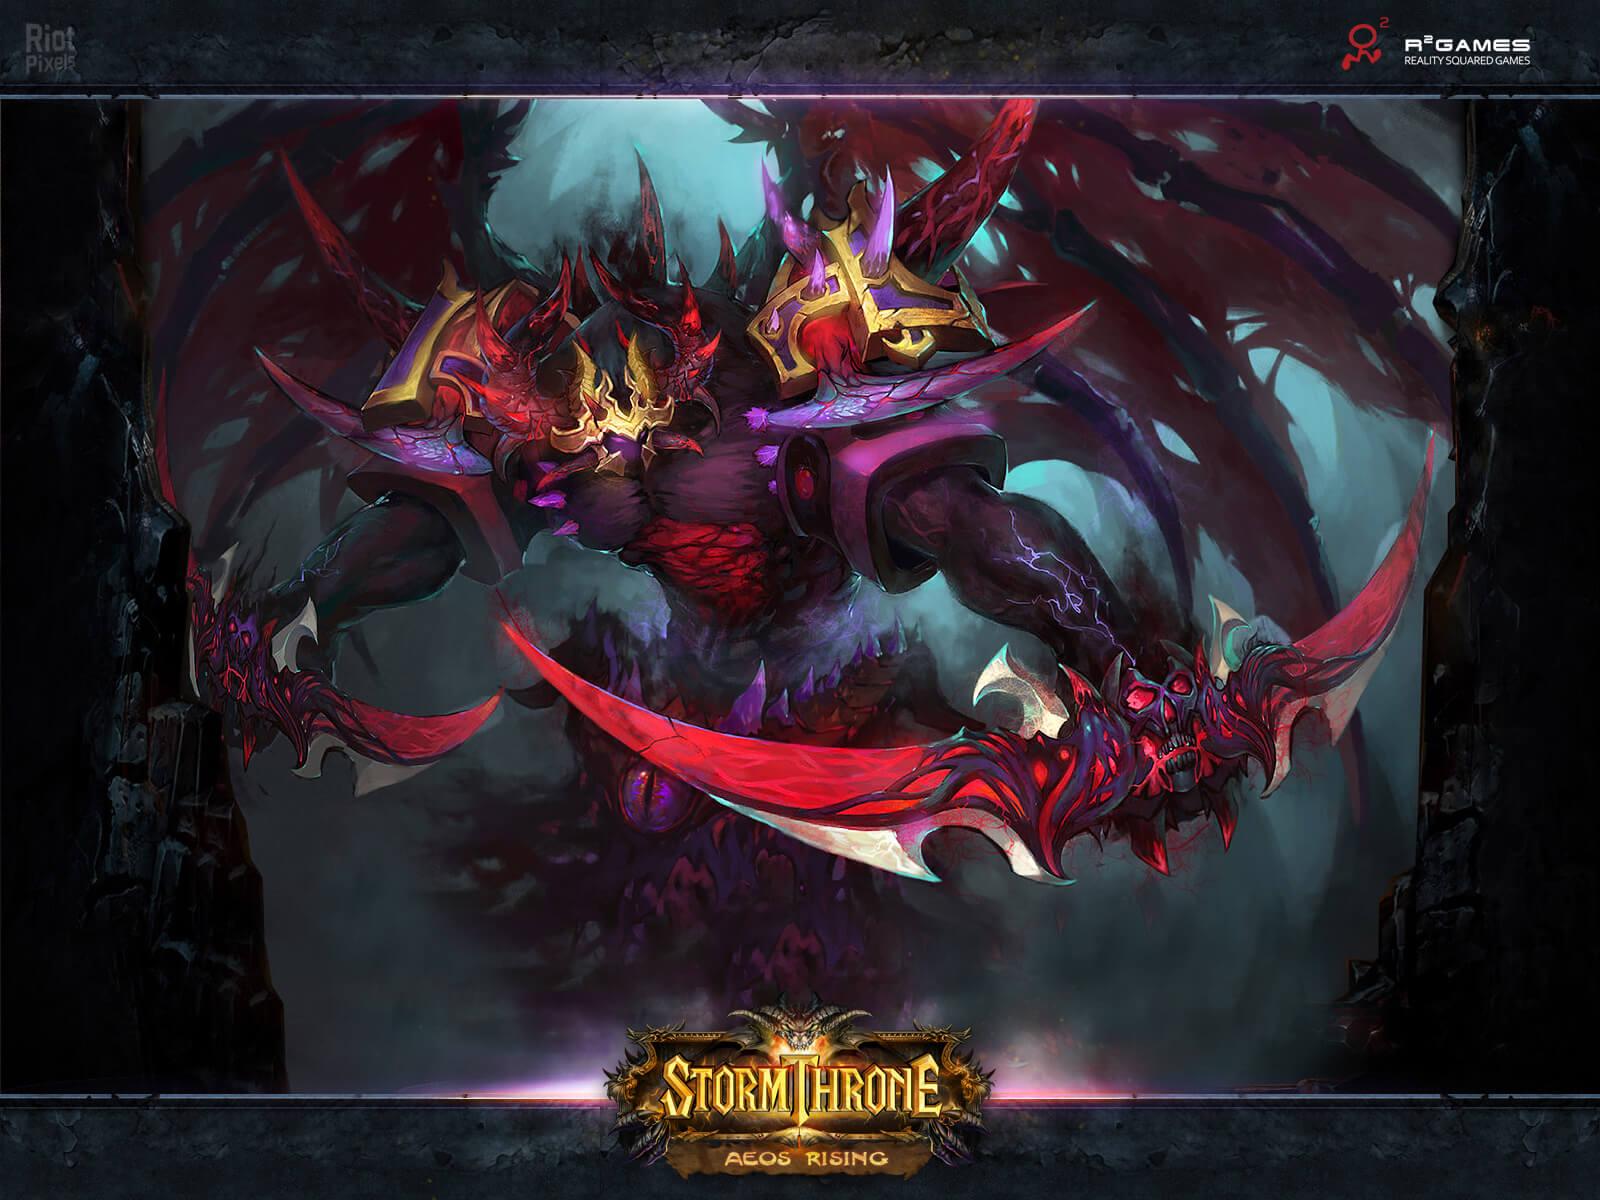 artwork.stormthrone-aeos-rising.1600x1200.2014-10-23.2